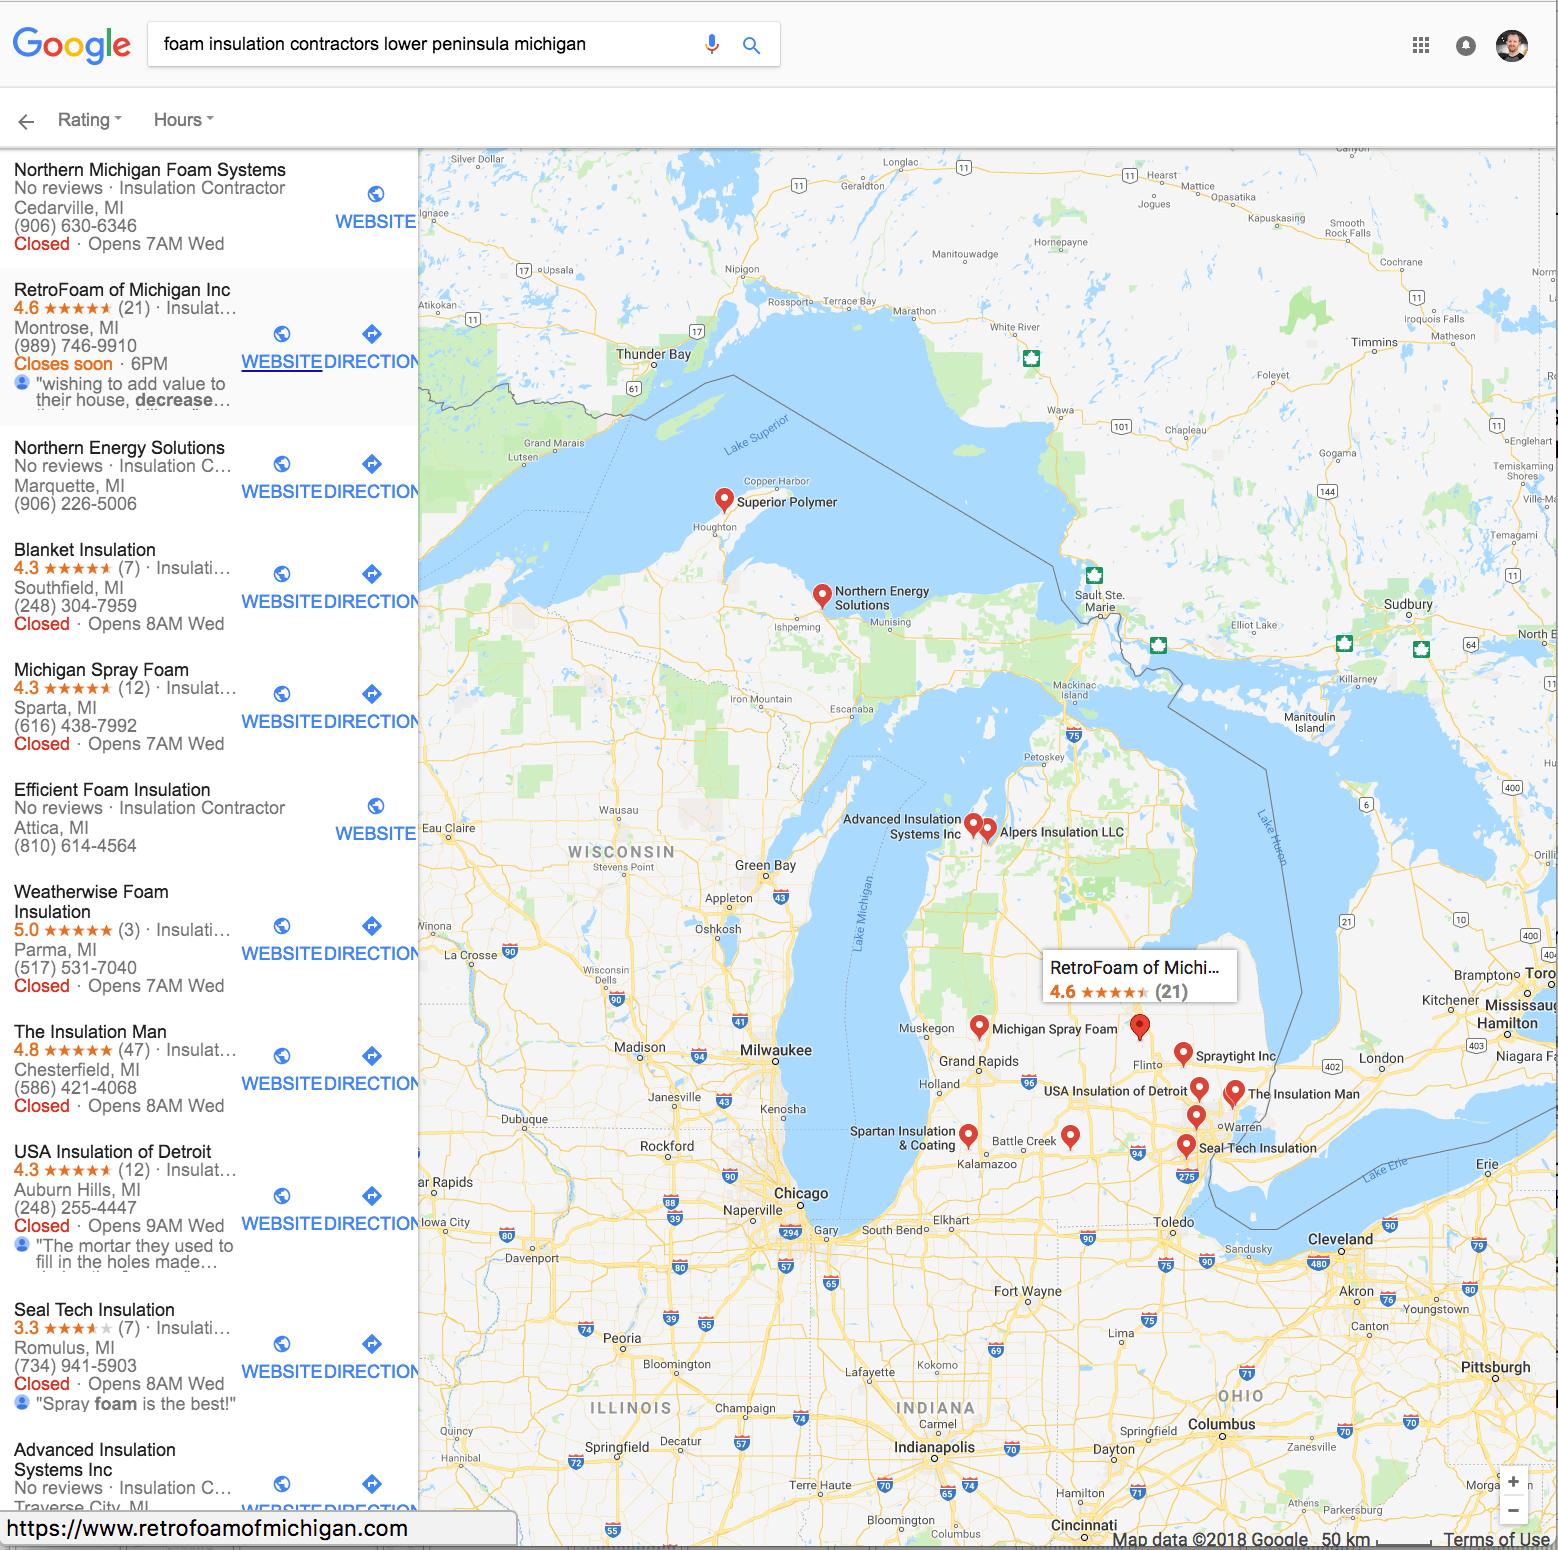 Google My Business Map Example (Retrofoam of Michigan)